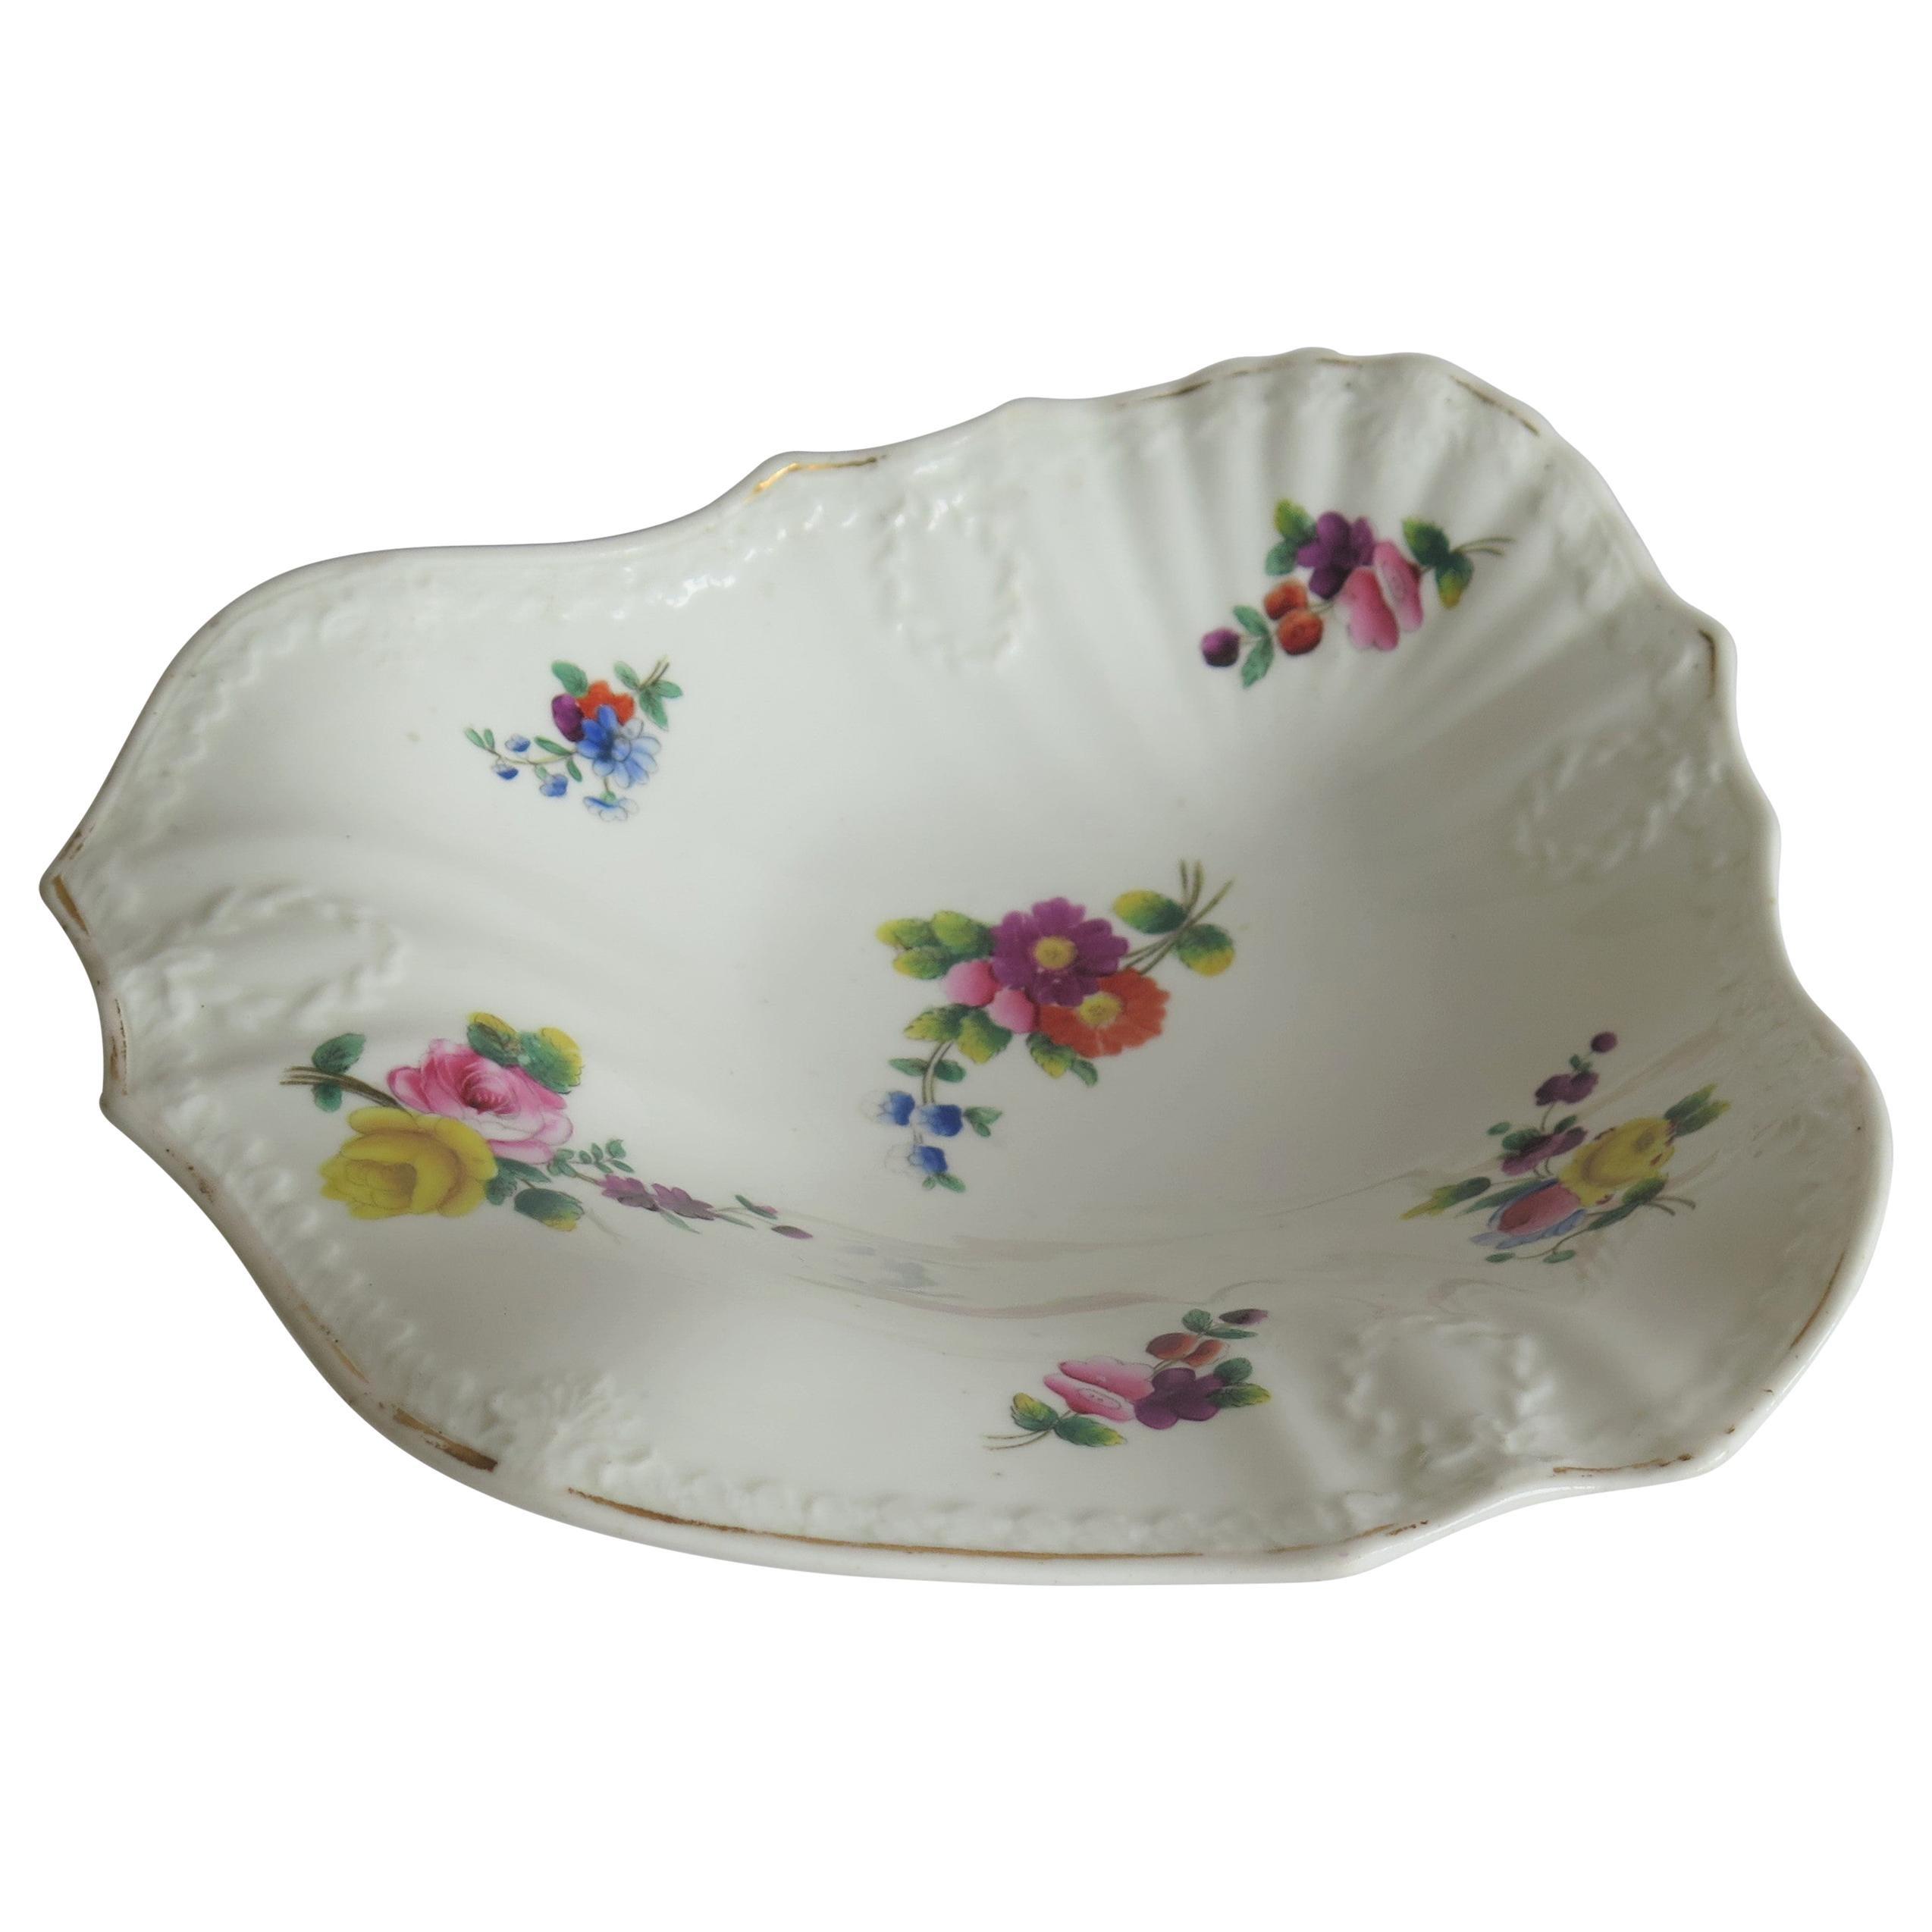 Fine H & R Daniel Porcelain Shell Dish in Recorded Pattern 3884, circa 1830